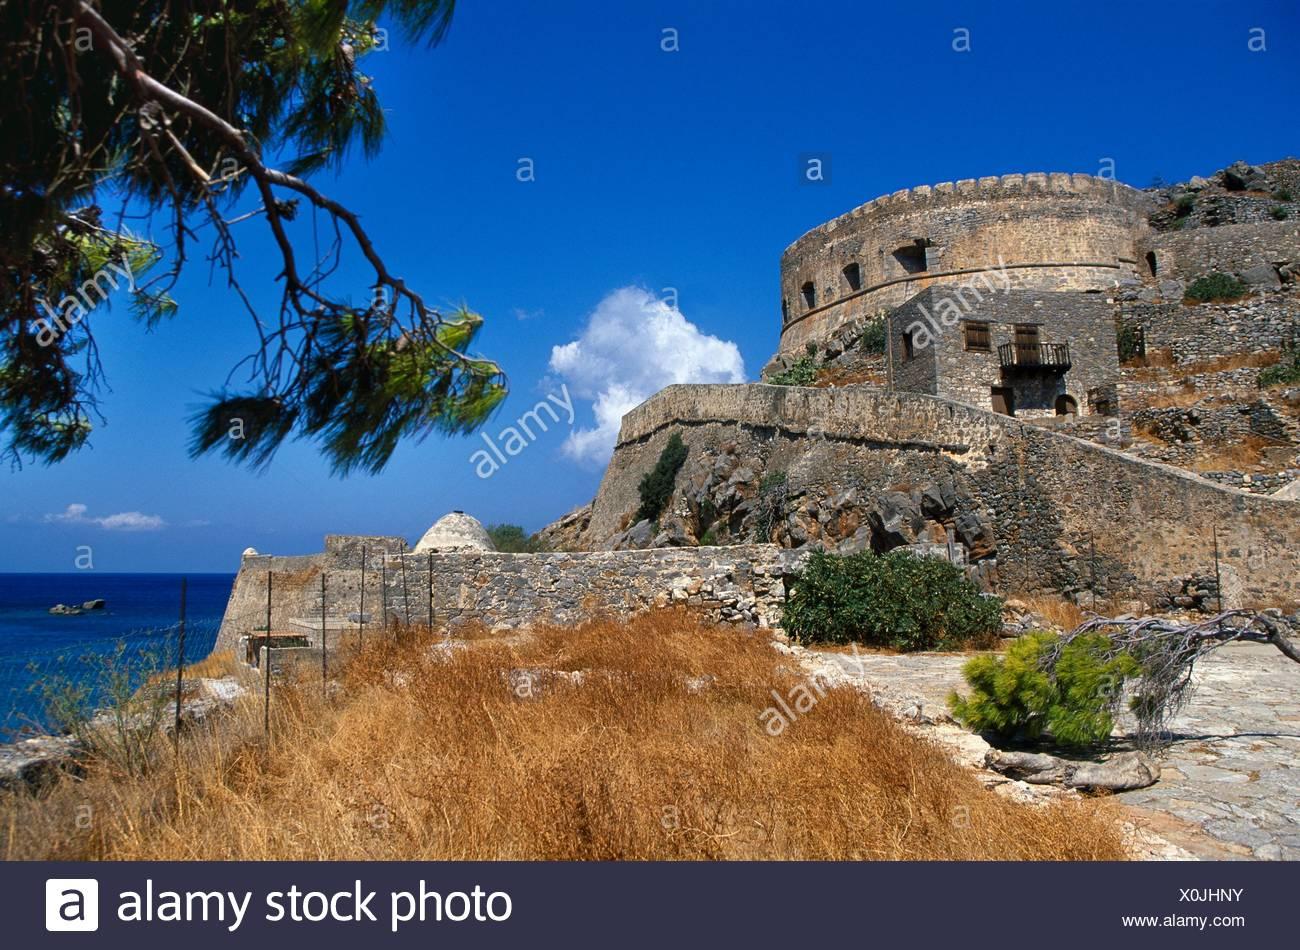 16th Century Venetian Fortress  Spinalonga Island  Gulf of Mirambello, Crete  Greece. Stock Photo